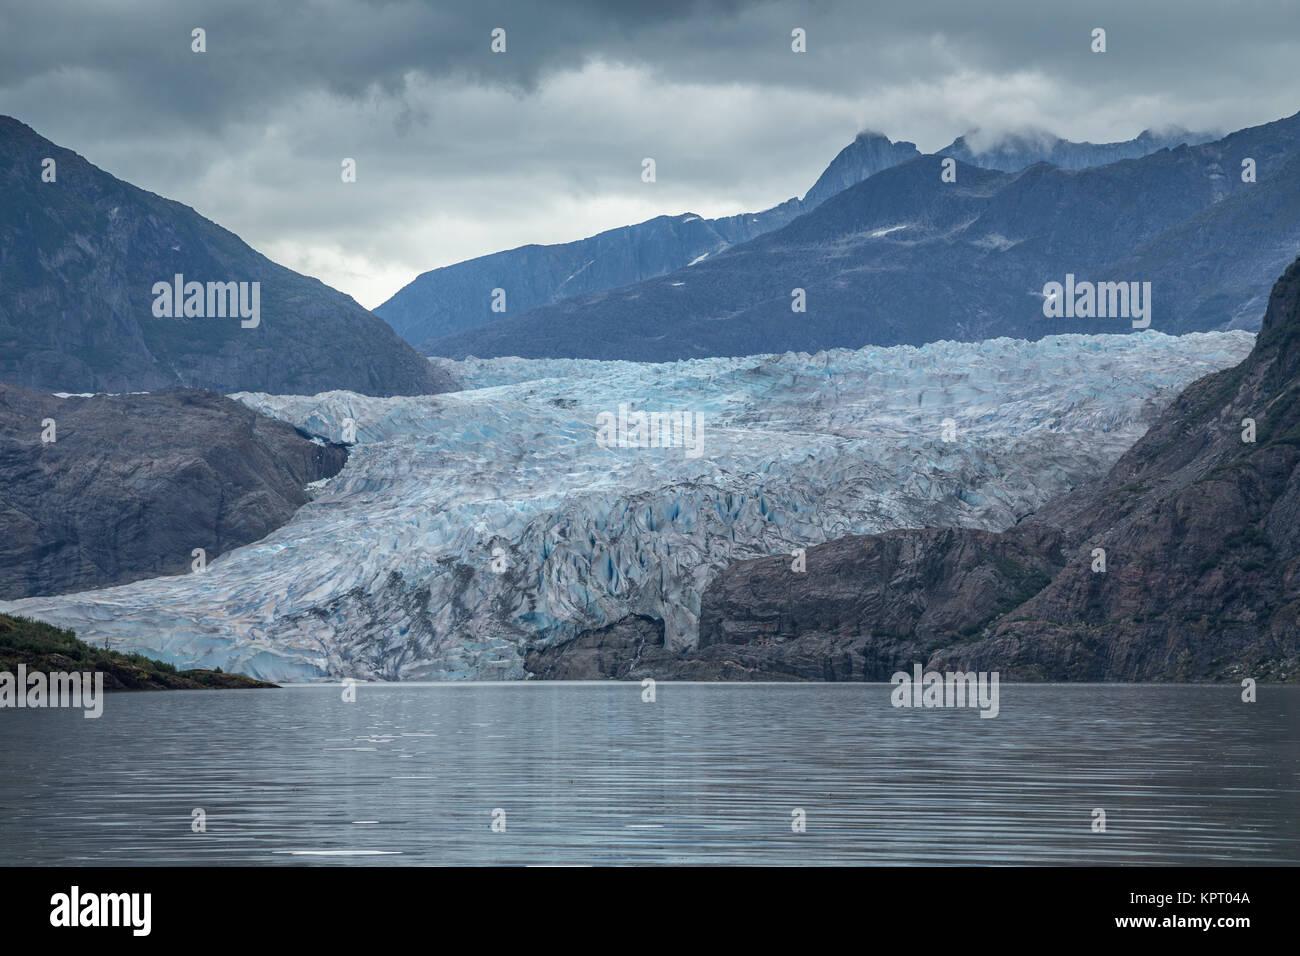 Mendenhall Glacier and lake near Juneau, the capital city of Alaska, USA - Stock Image